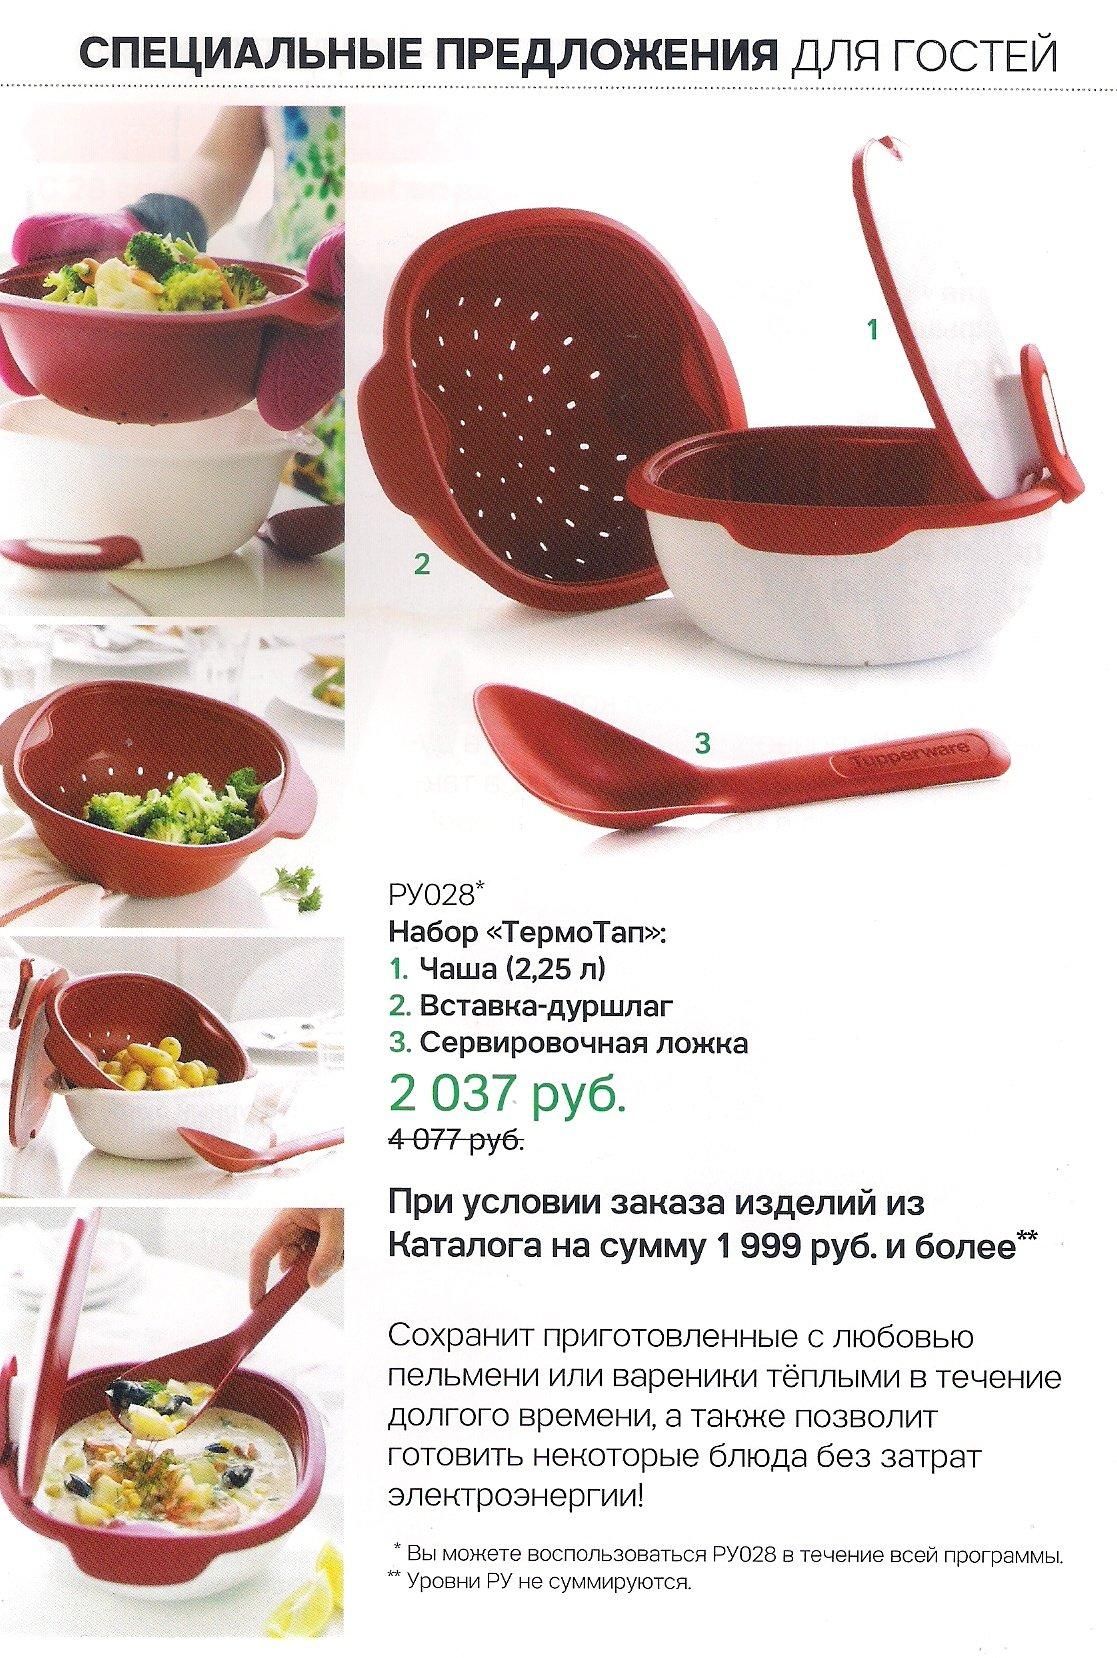 http://tupperware-online.ru/images/upload/21d.jpg